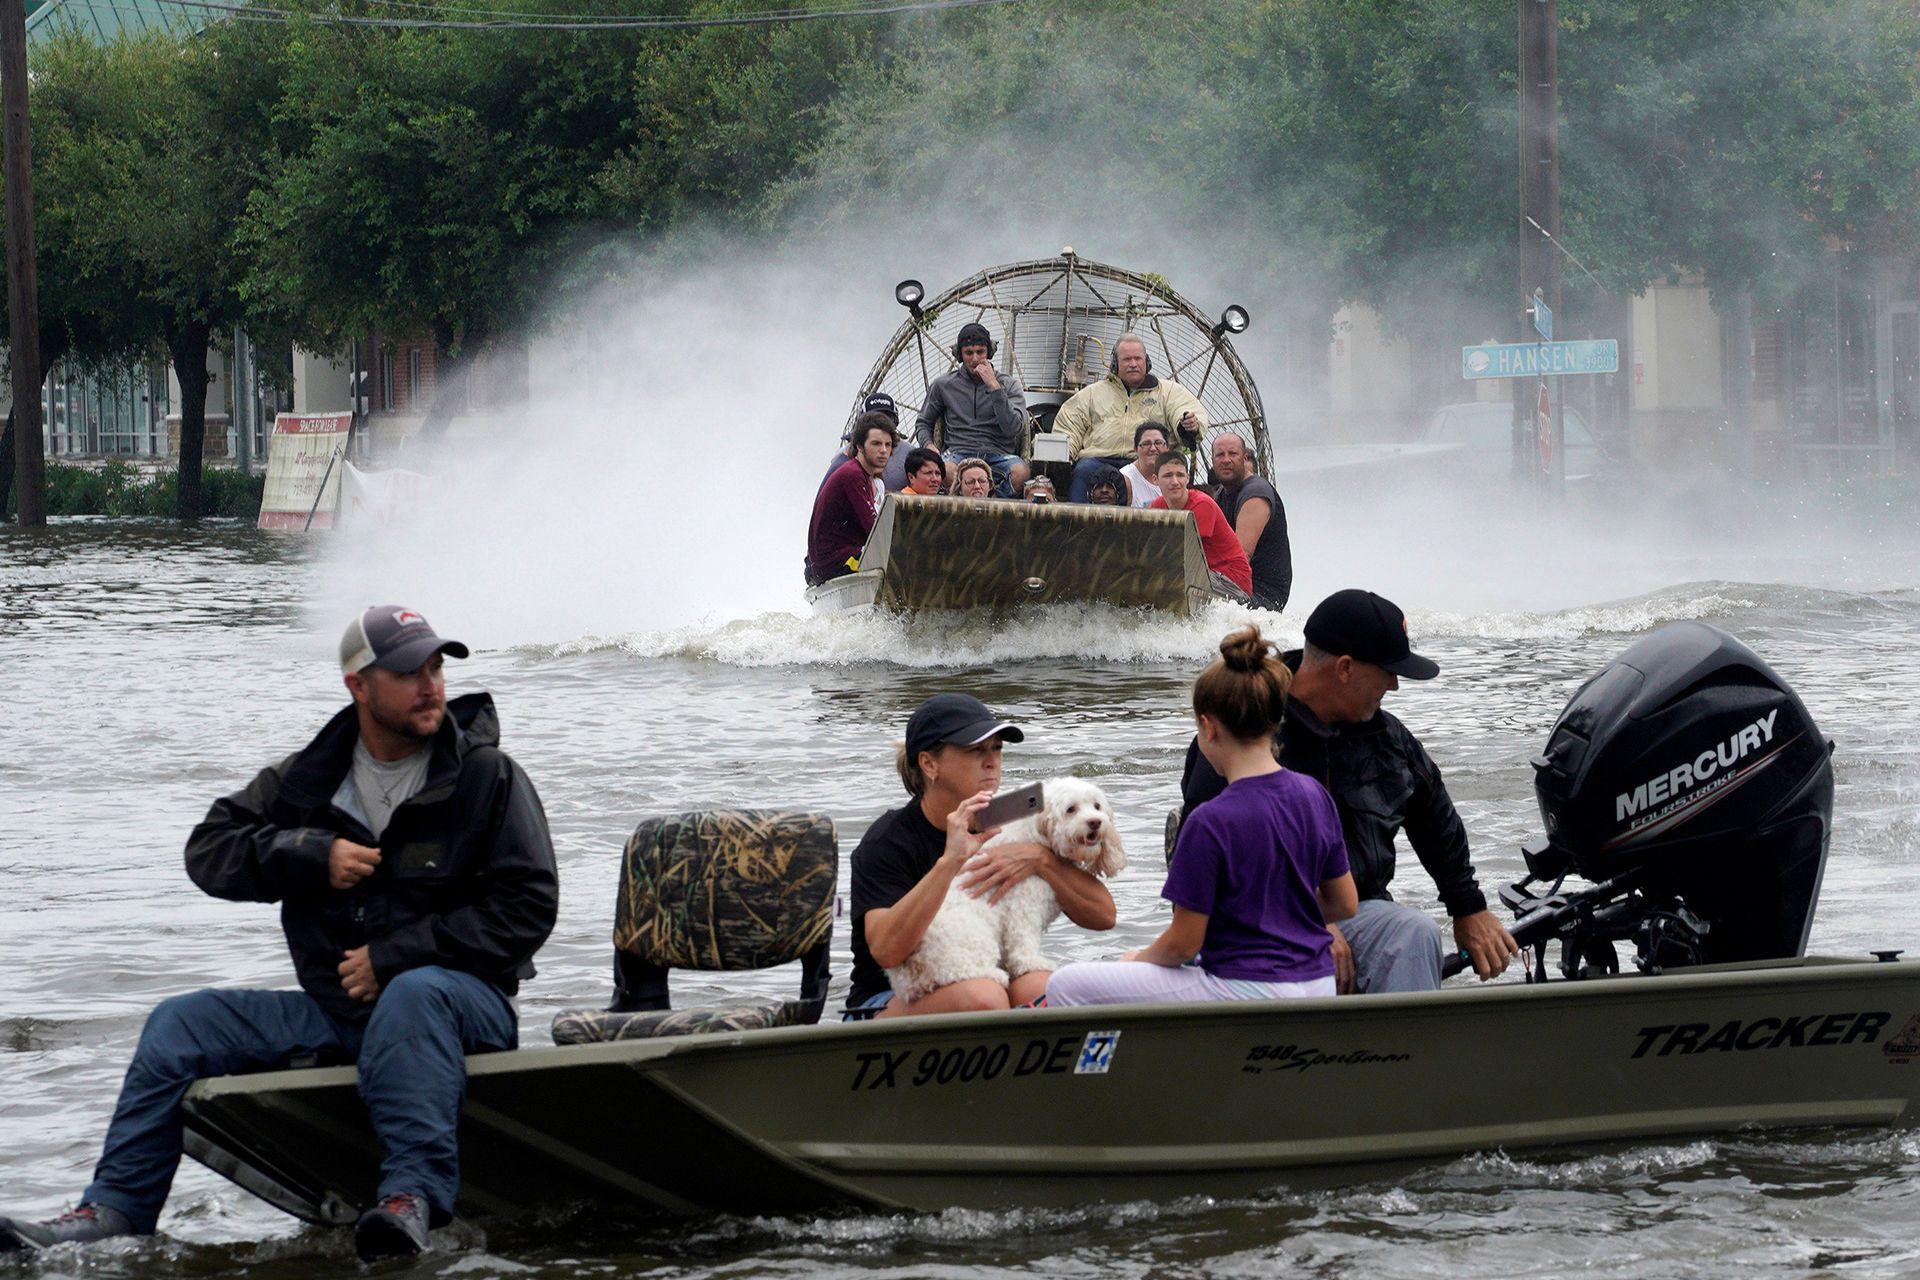 Fox News Texas City Requires No Israel Boycott In Exchange For Hurricane Relief Houston Flooding Texas City Cajun Navy